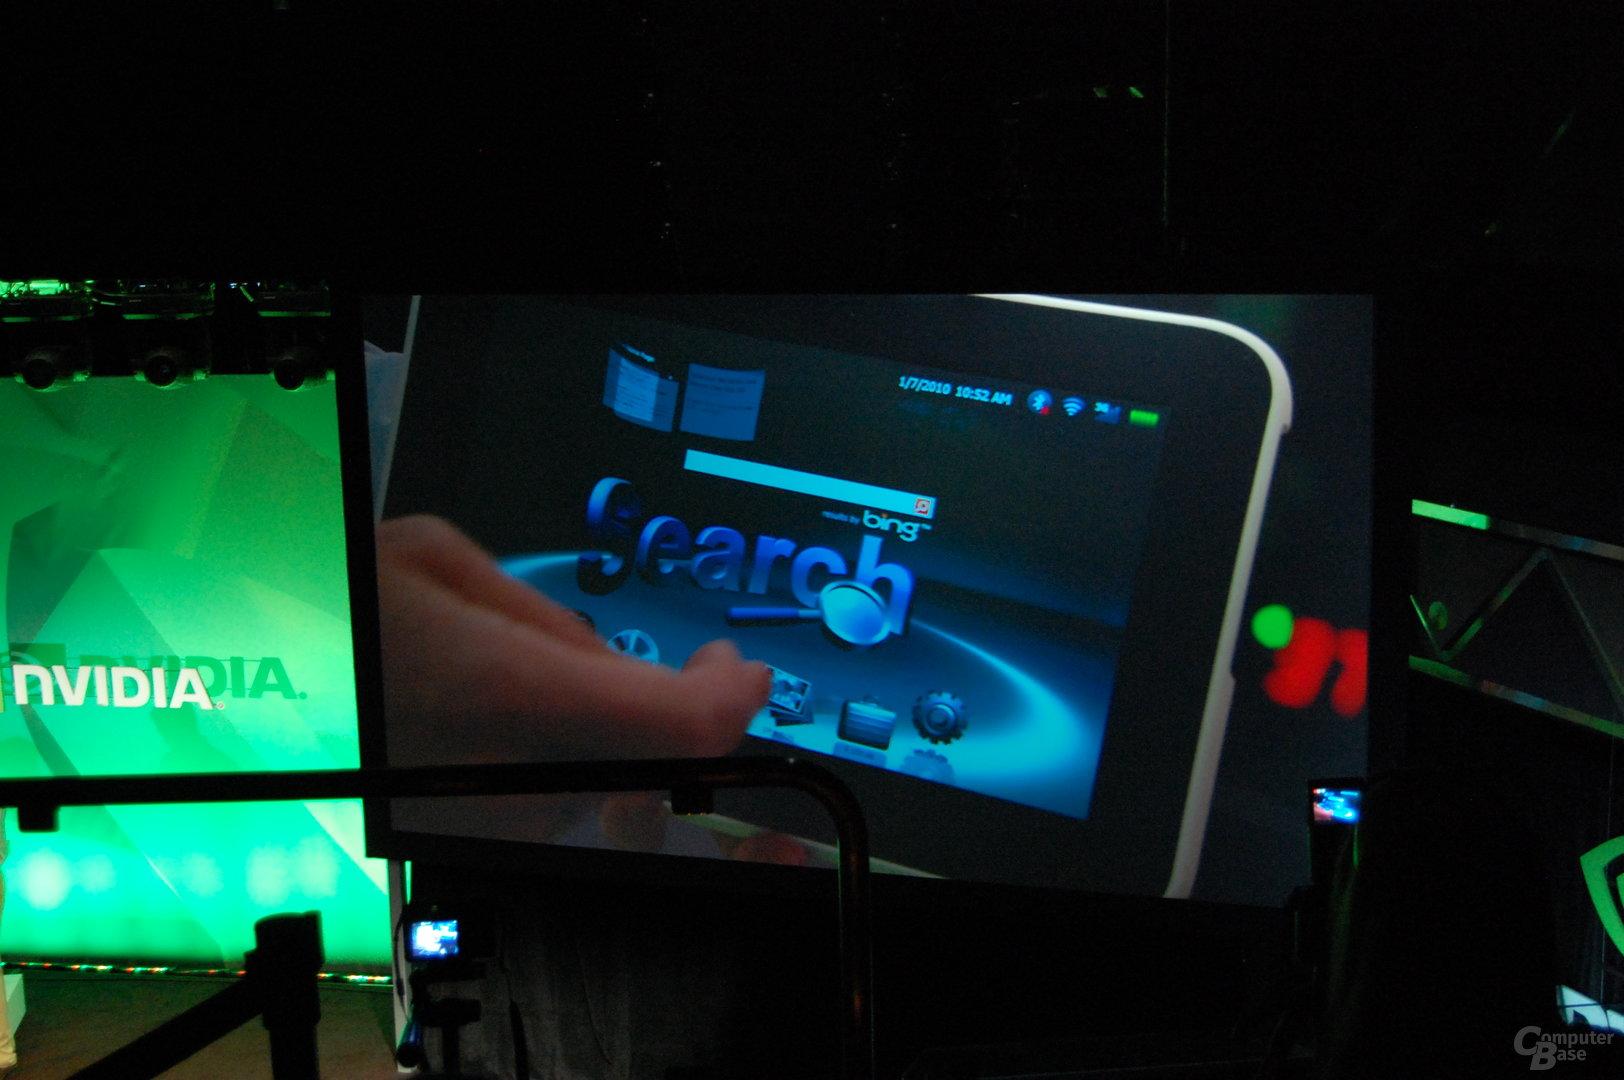 Nvidia stellt neue Tegra-Prozessoren vor